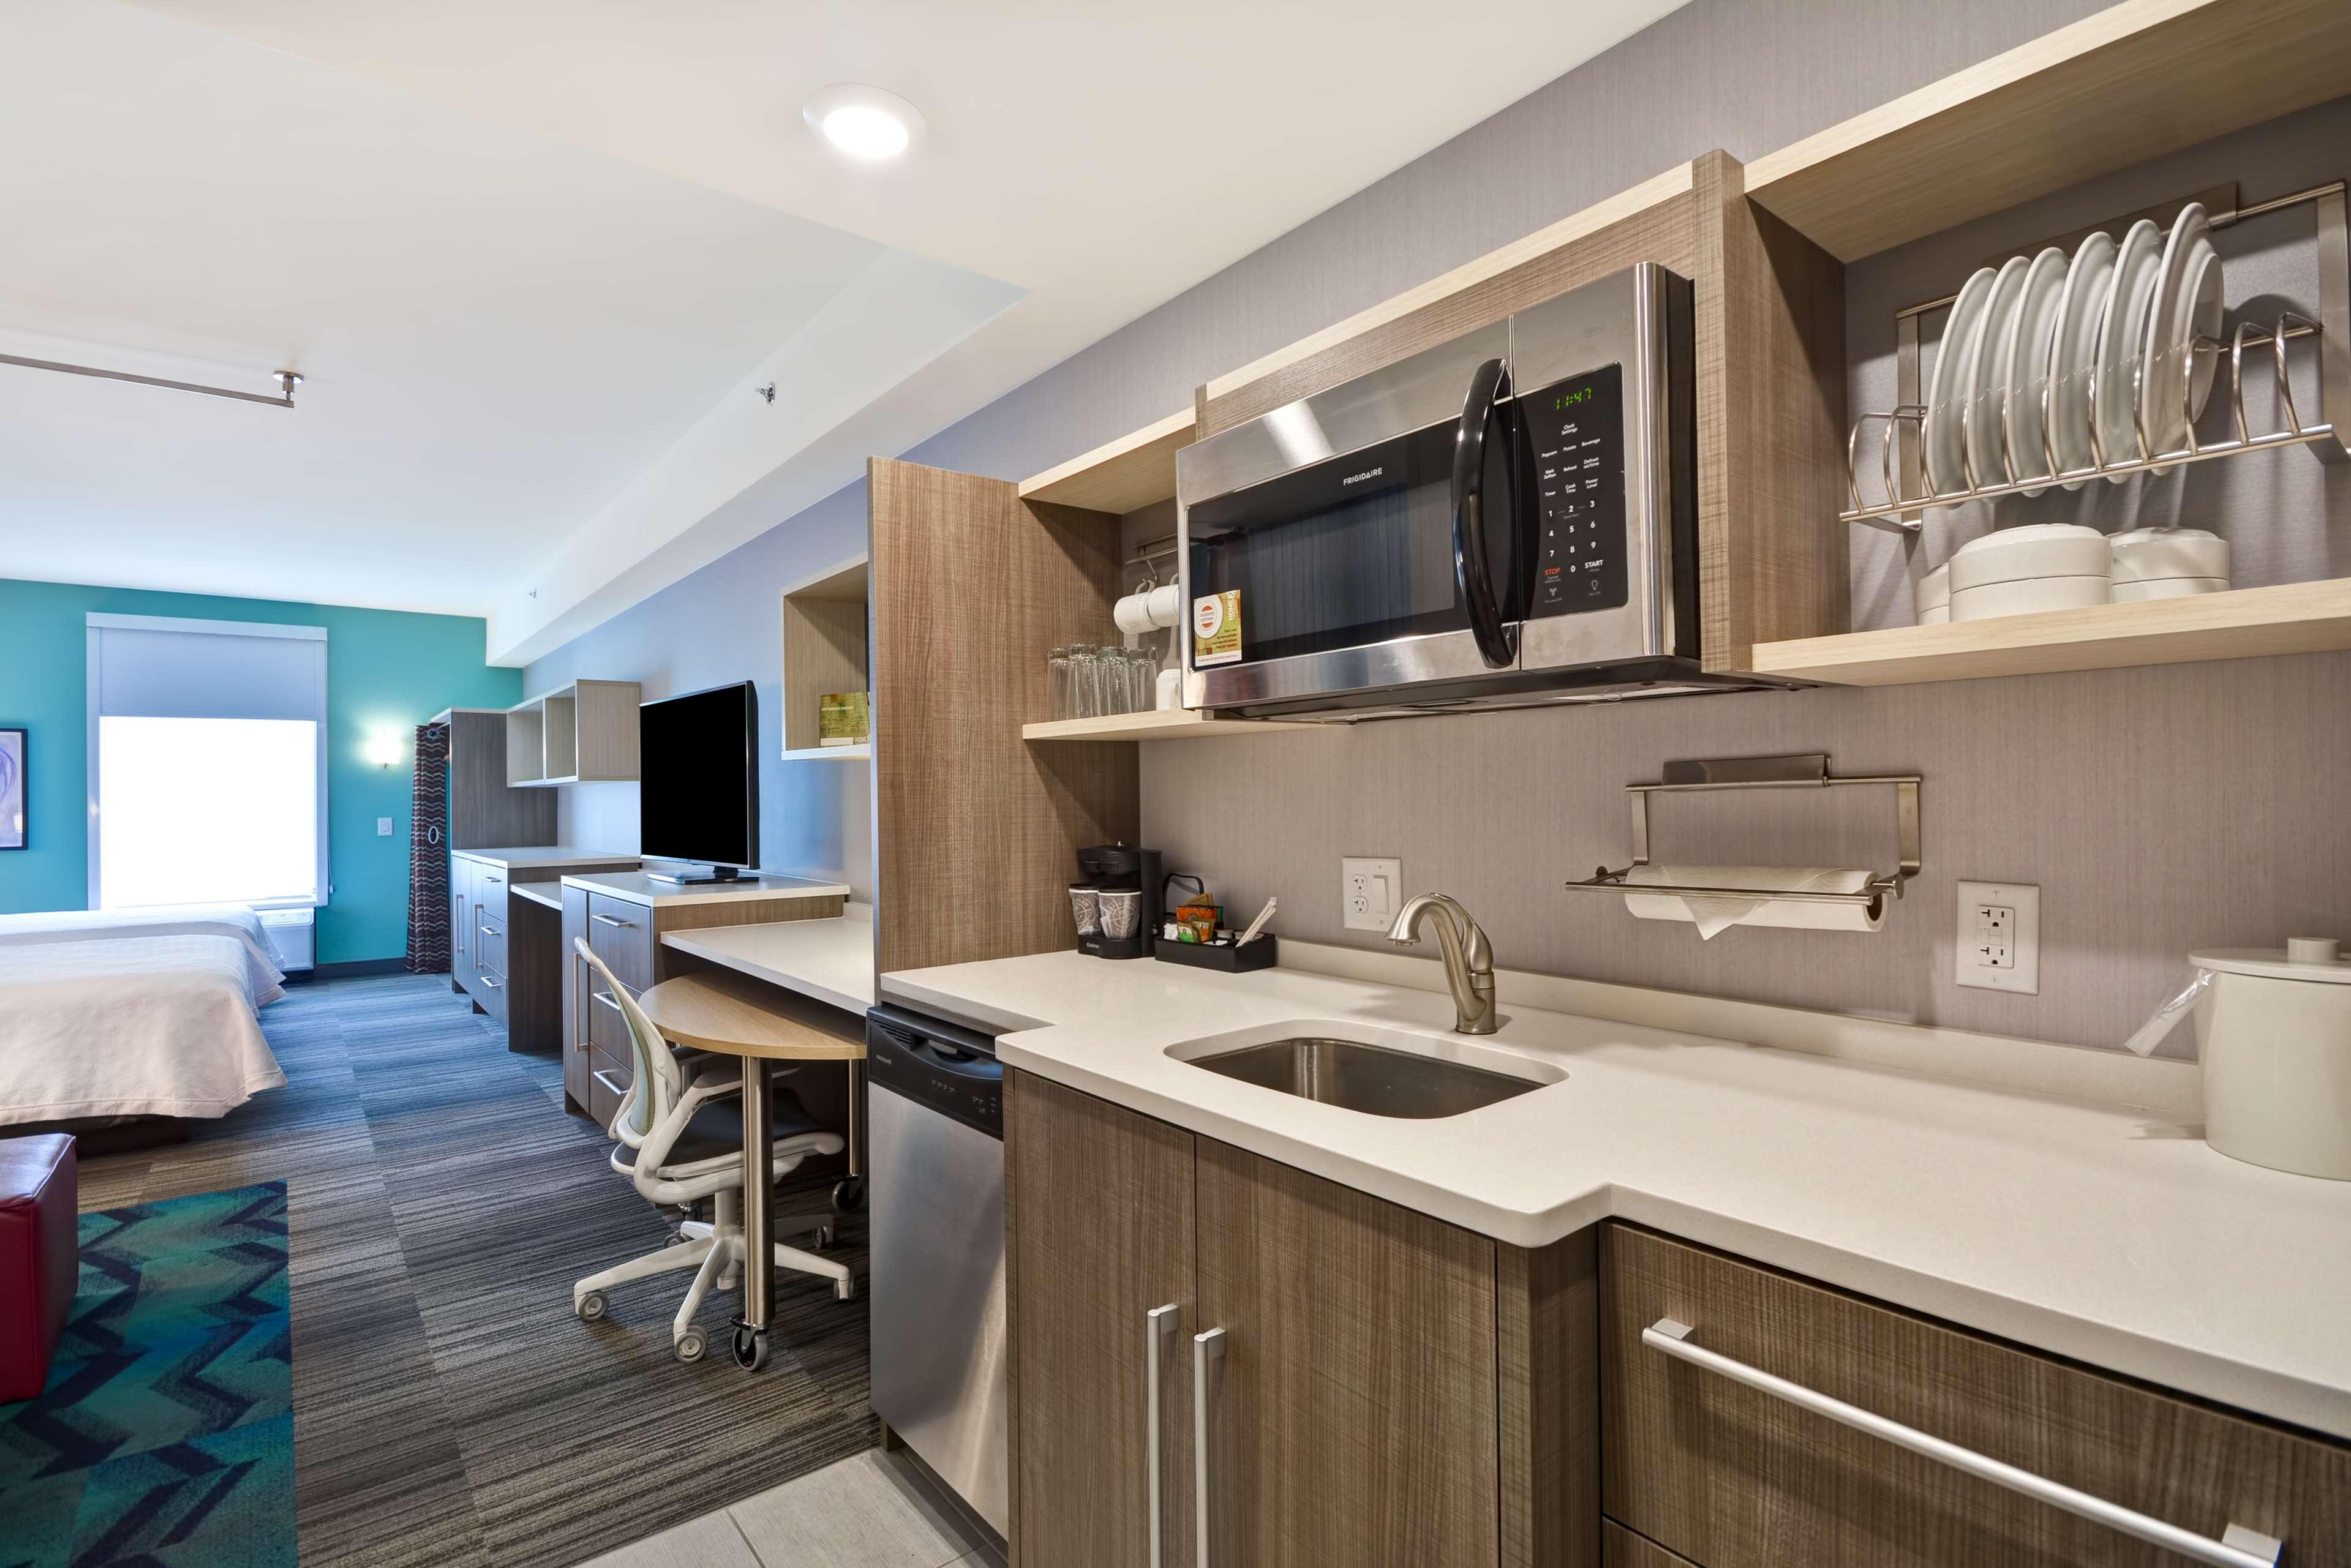 Home2 Suites by Hilton Atlanta West Lithia Springs image 29